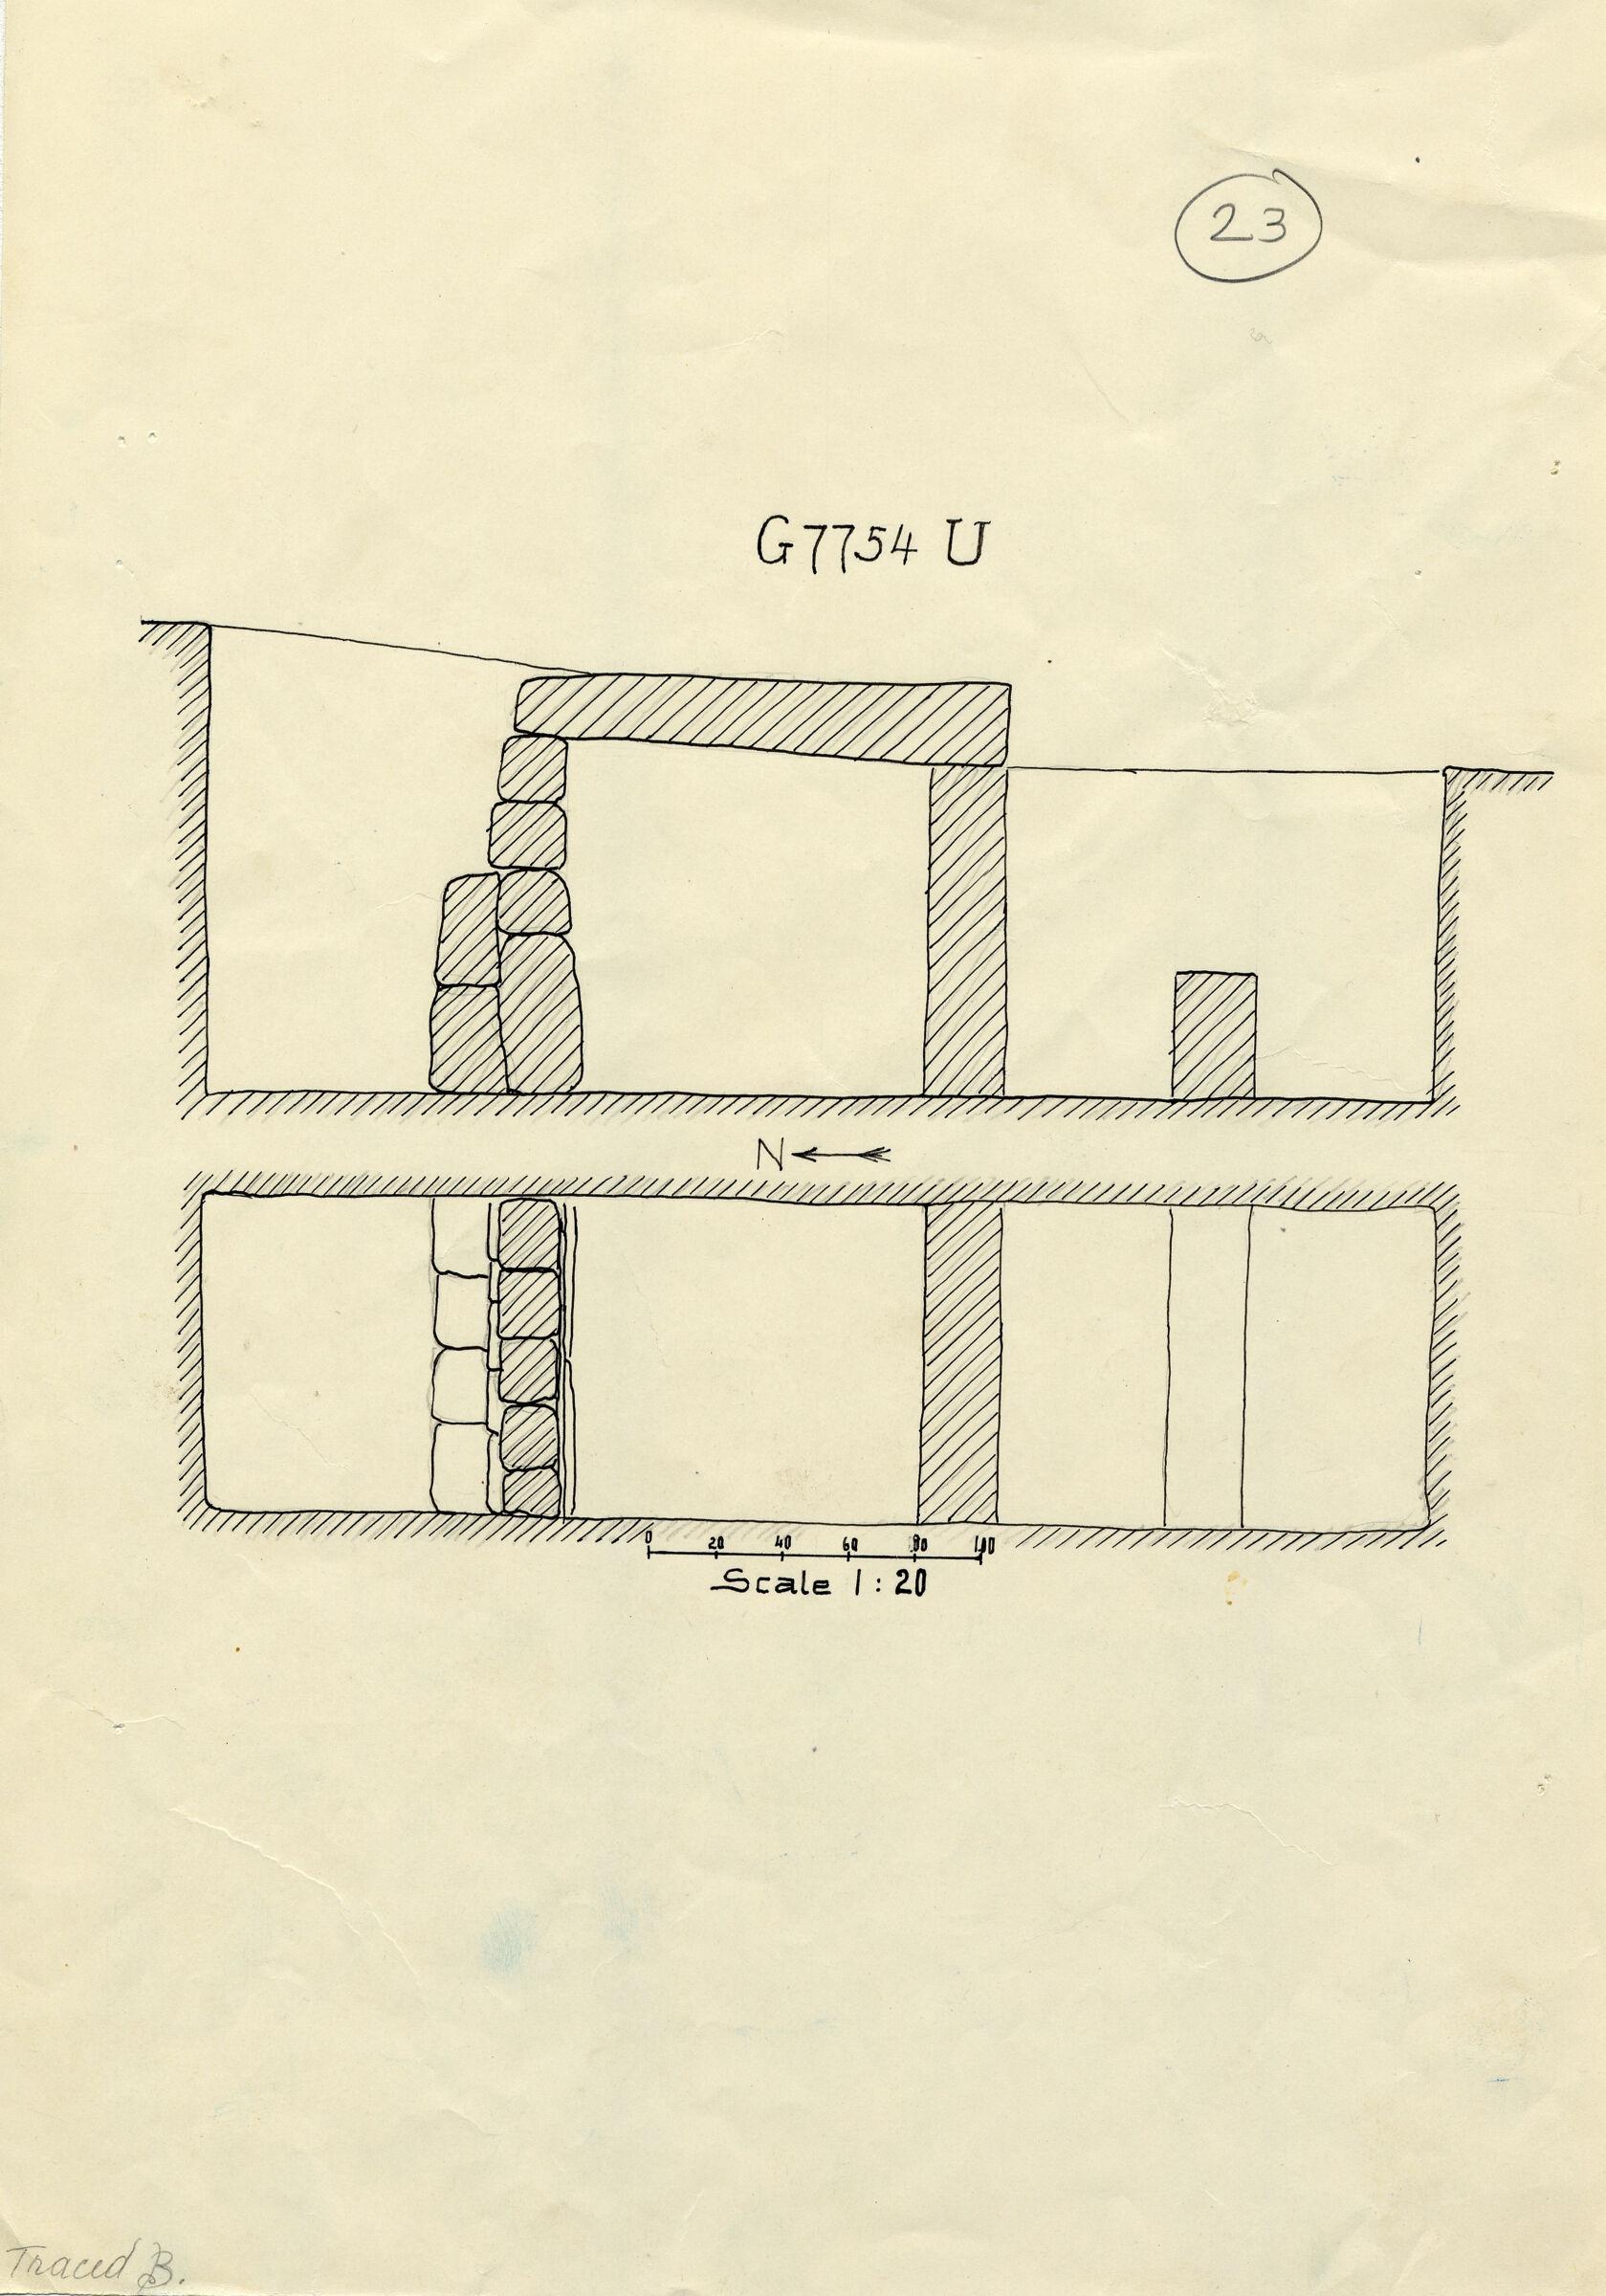 Maps and plans: G 7754, Shaft U